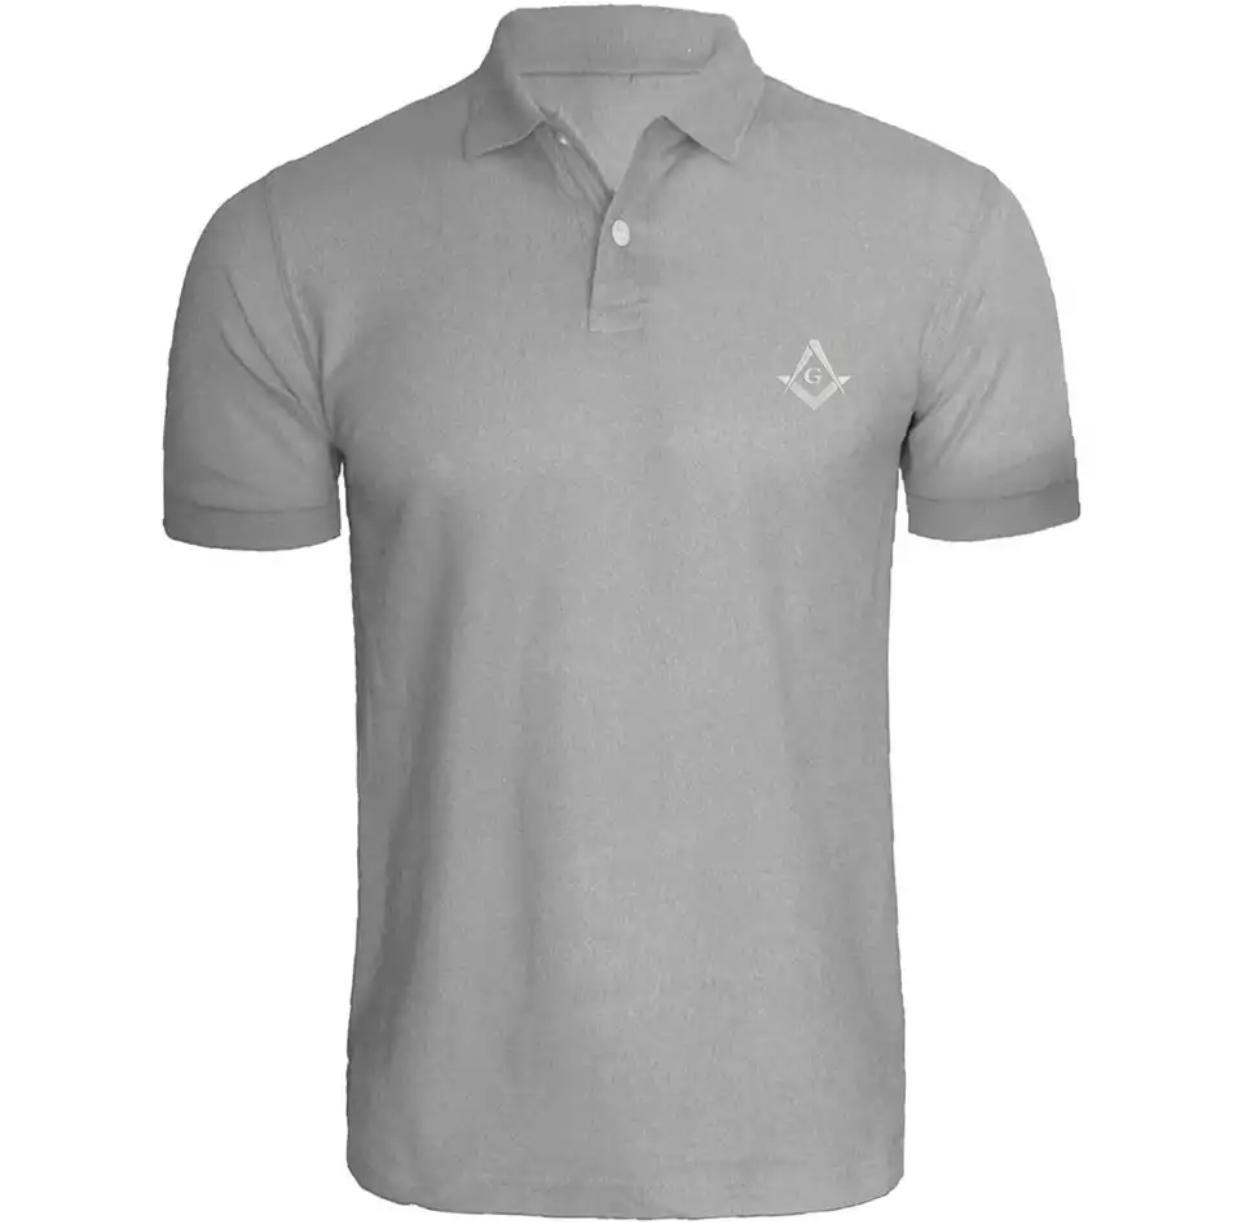 Camisa Polo Maçonaria - Branca